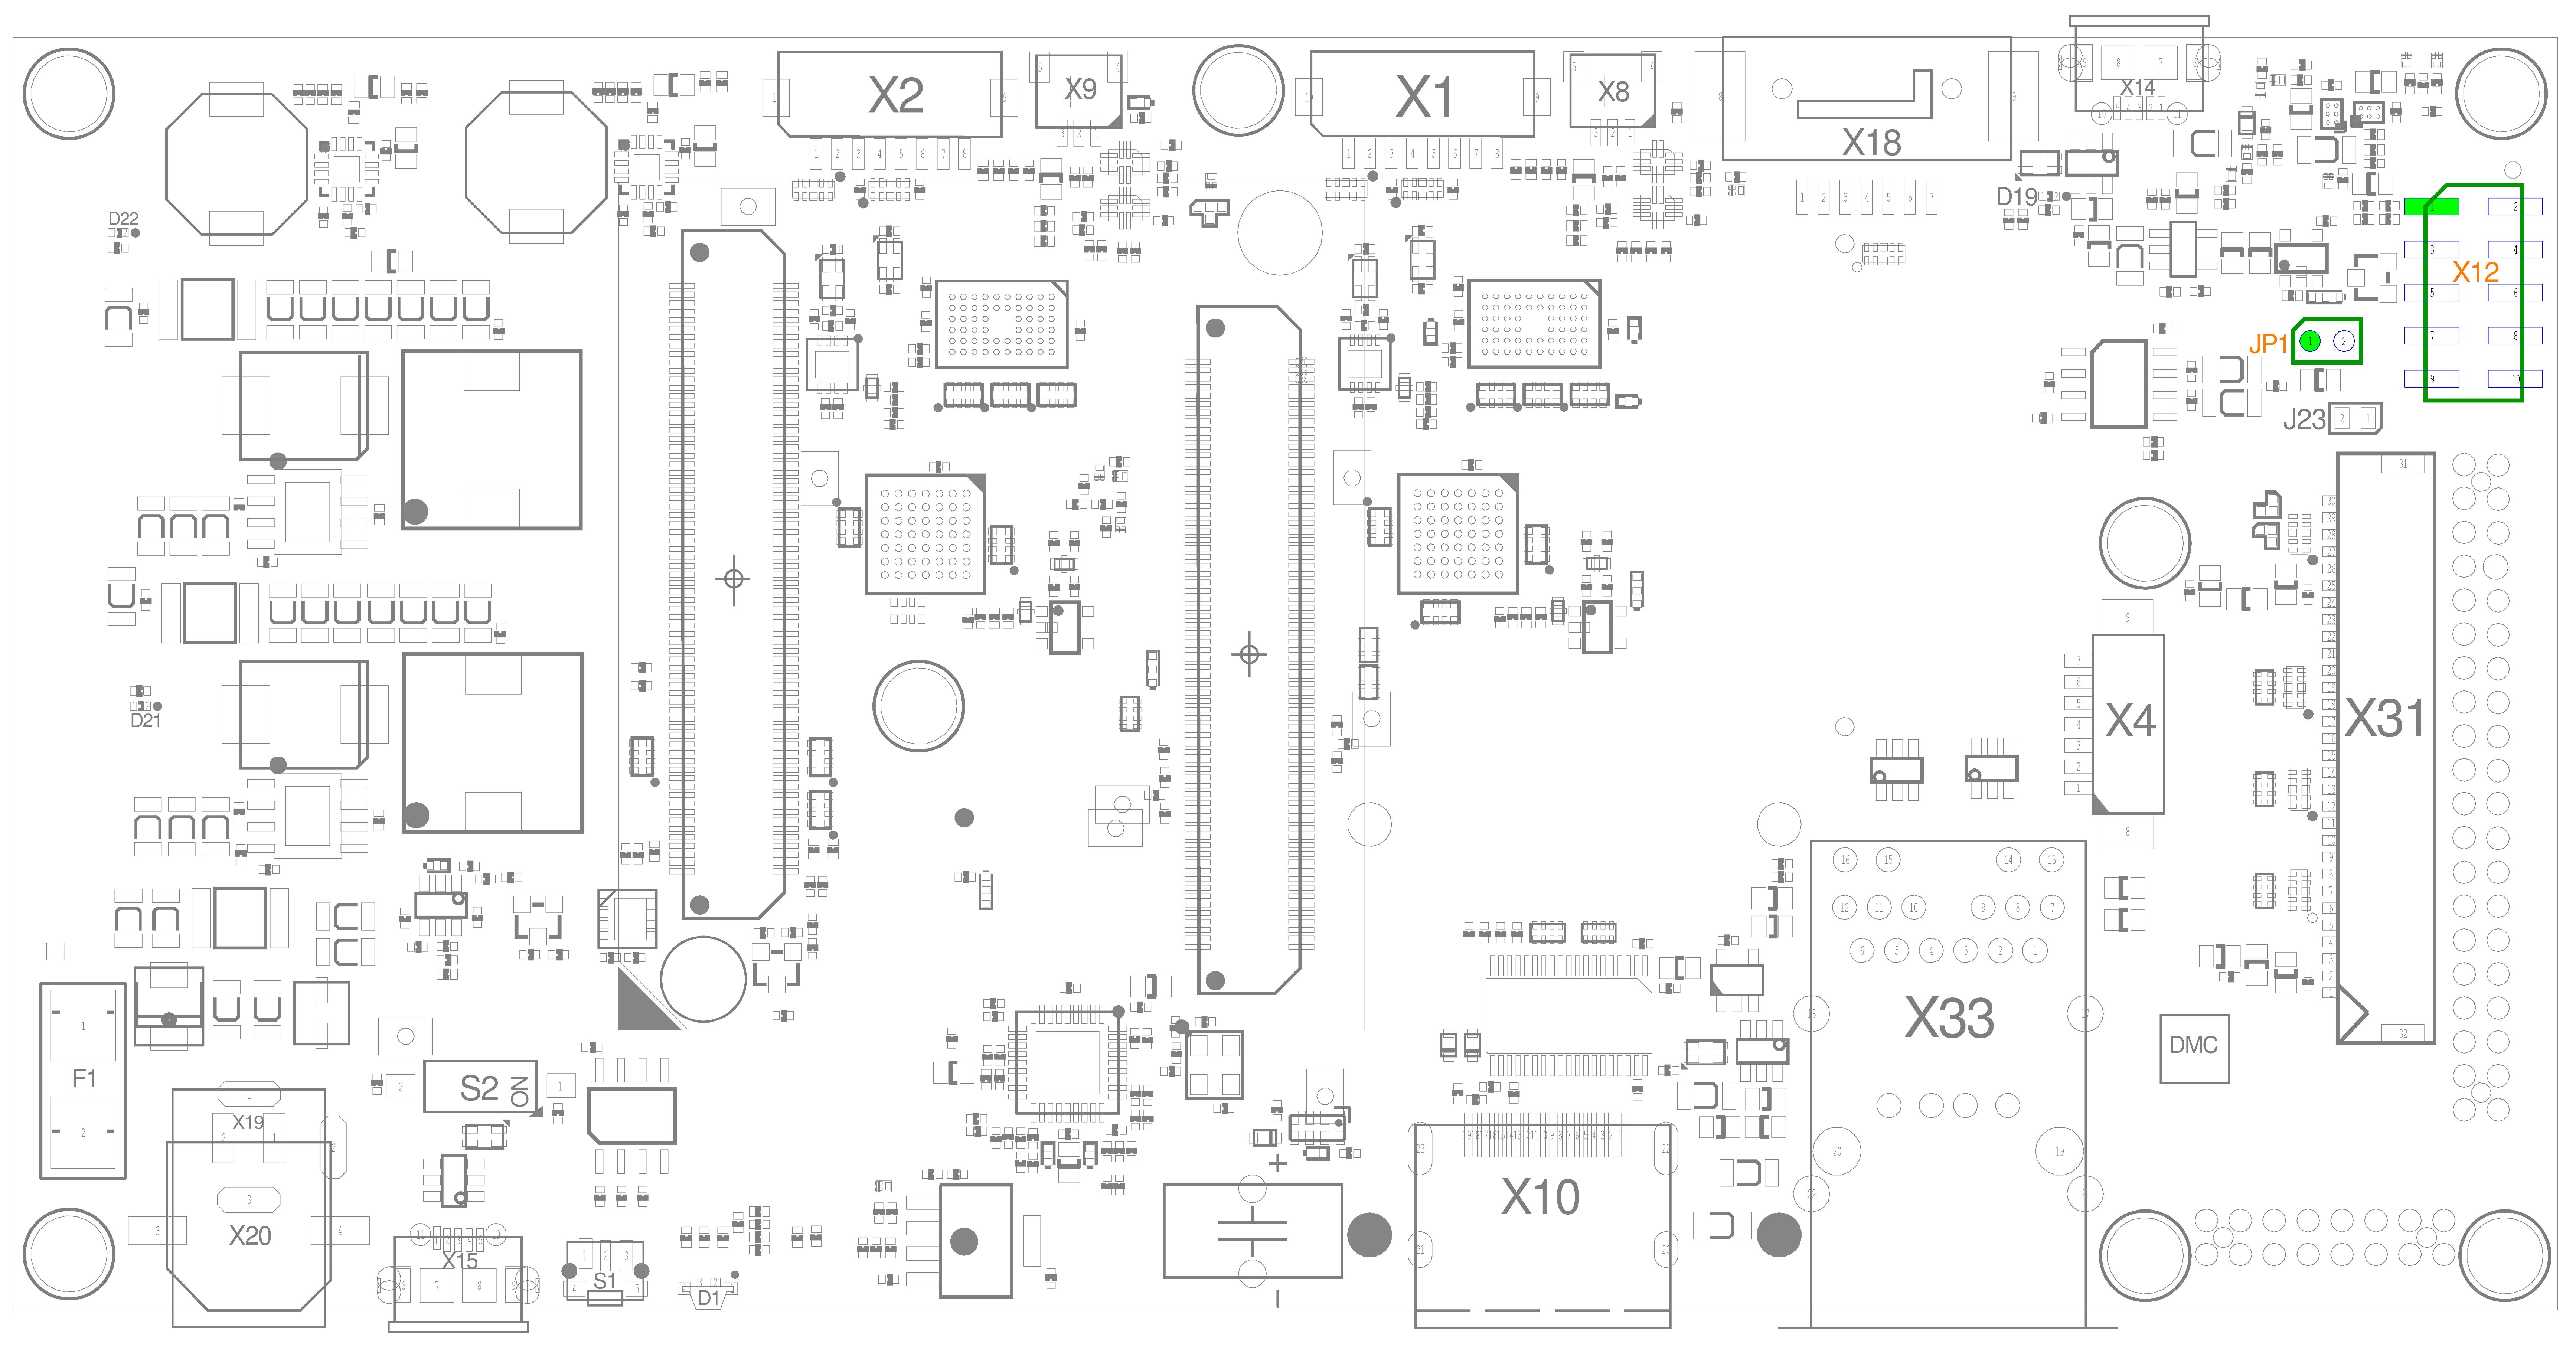 CAN Interface (X12, JP1)